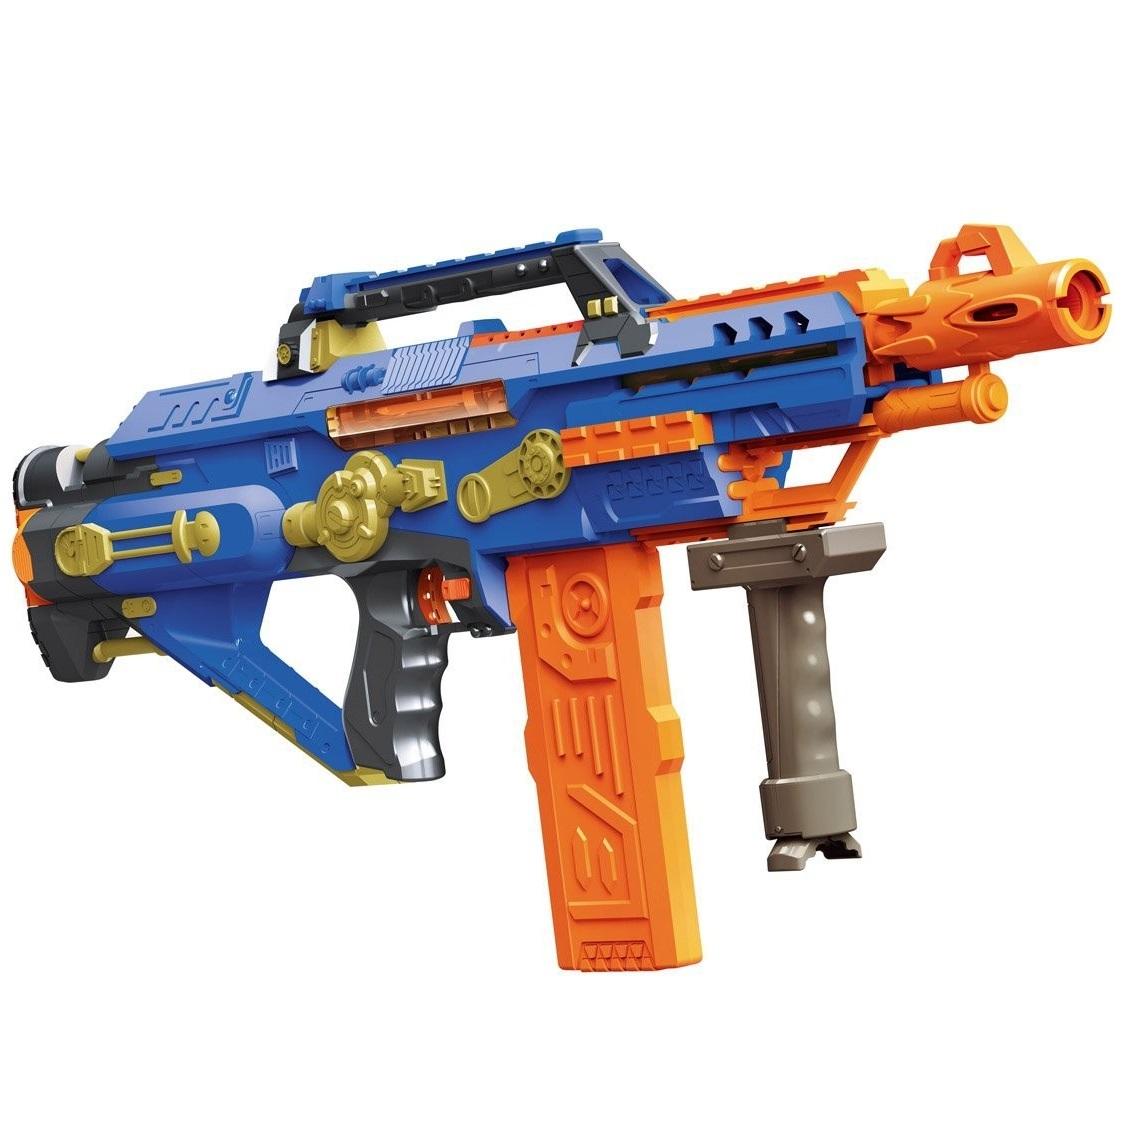 Автомат Zecong Toys с мягкими пулями 7003/7052